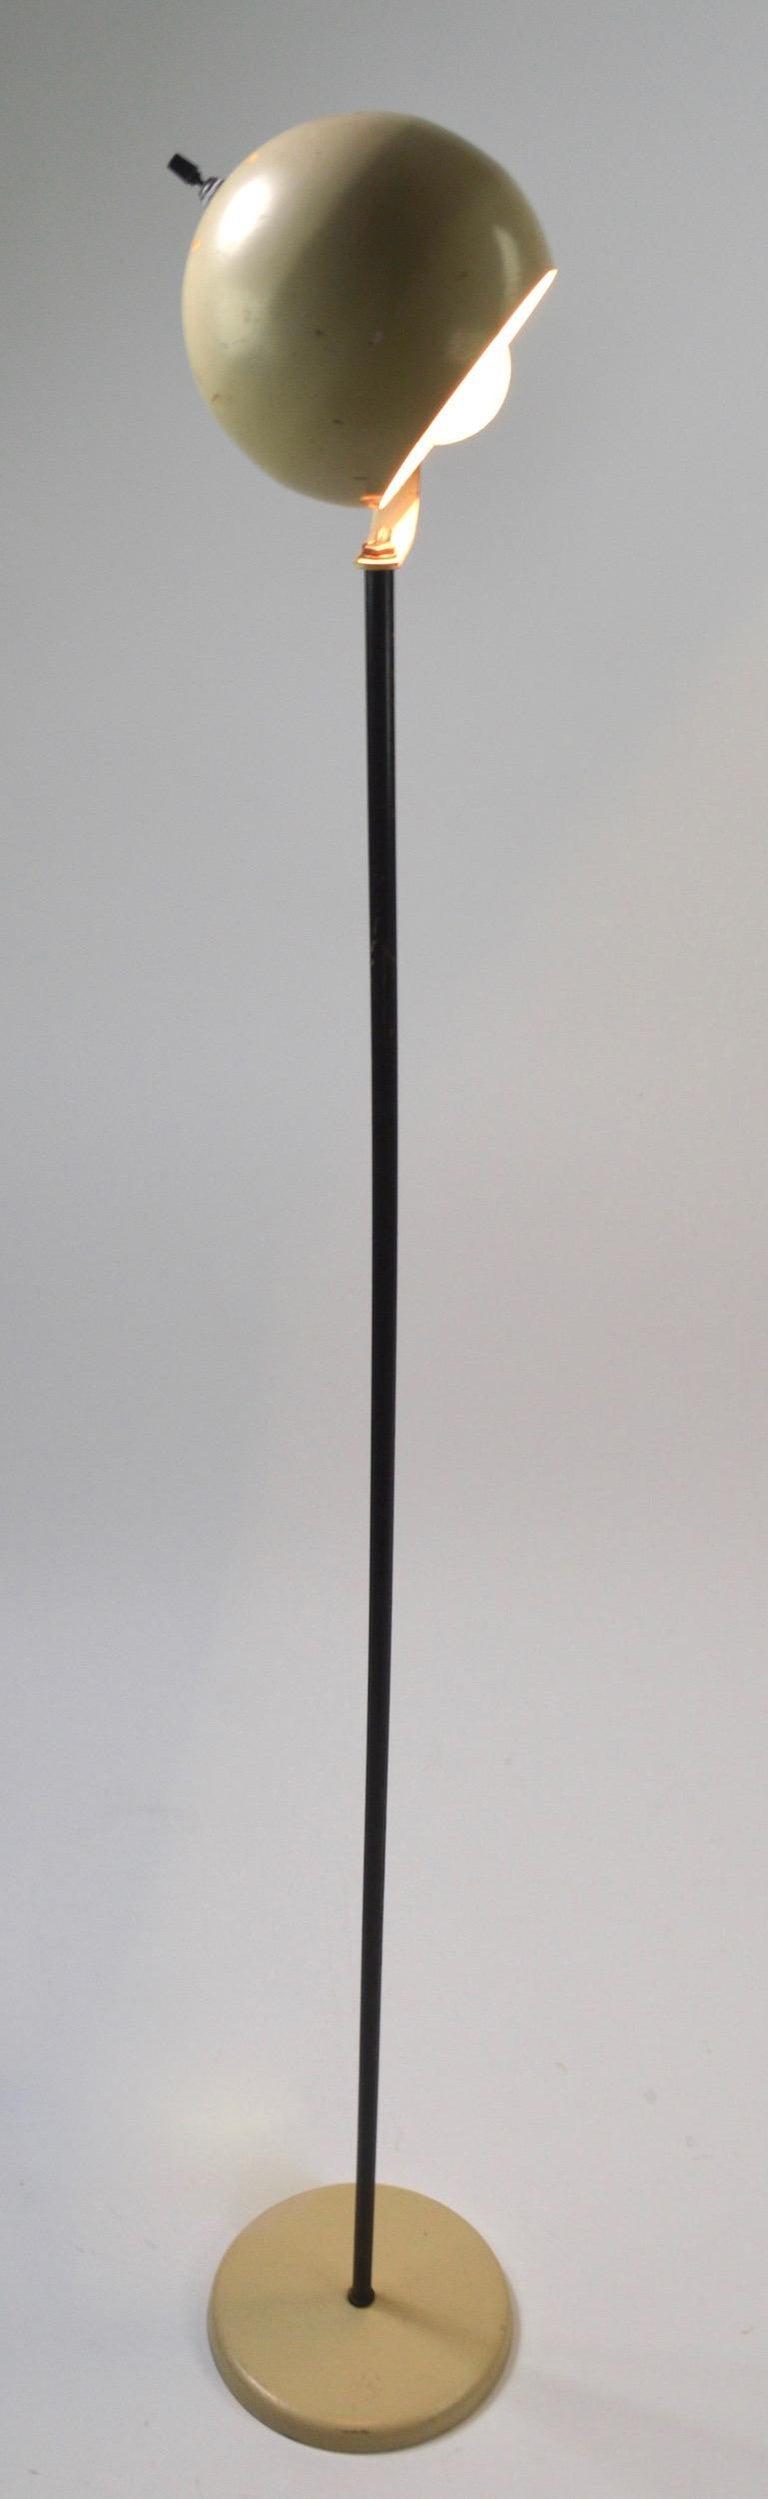 Mid-Century Modern Cream and Black Ball Shade Floor Lamp by Sonneman For Sale